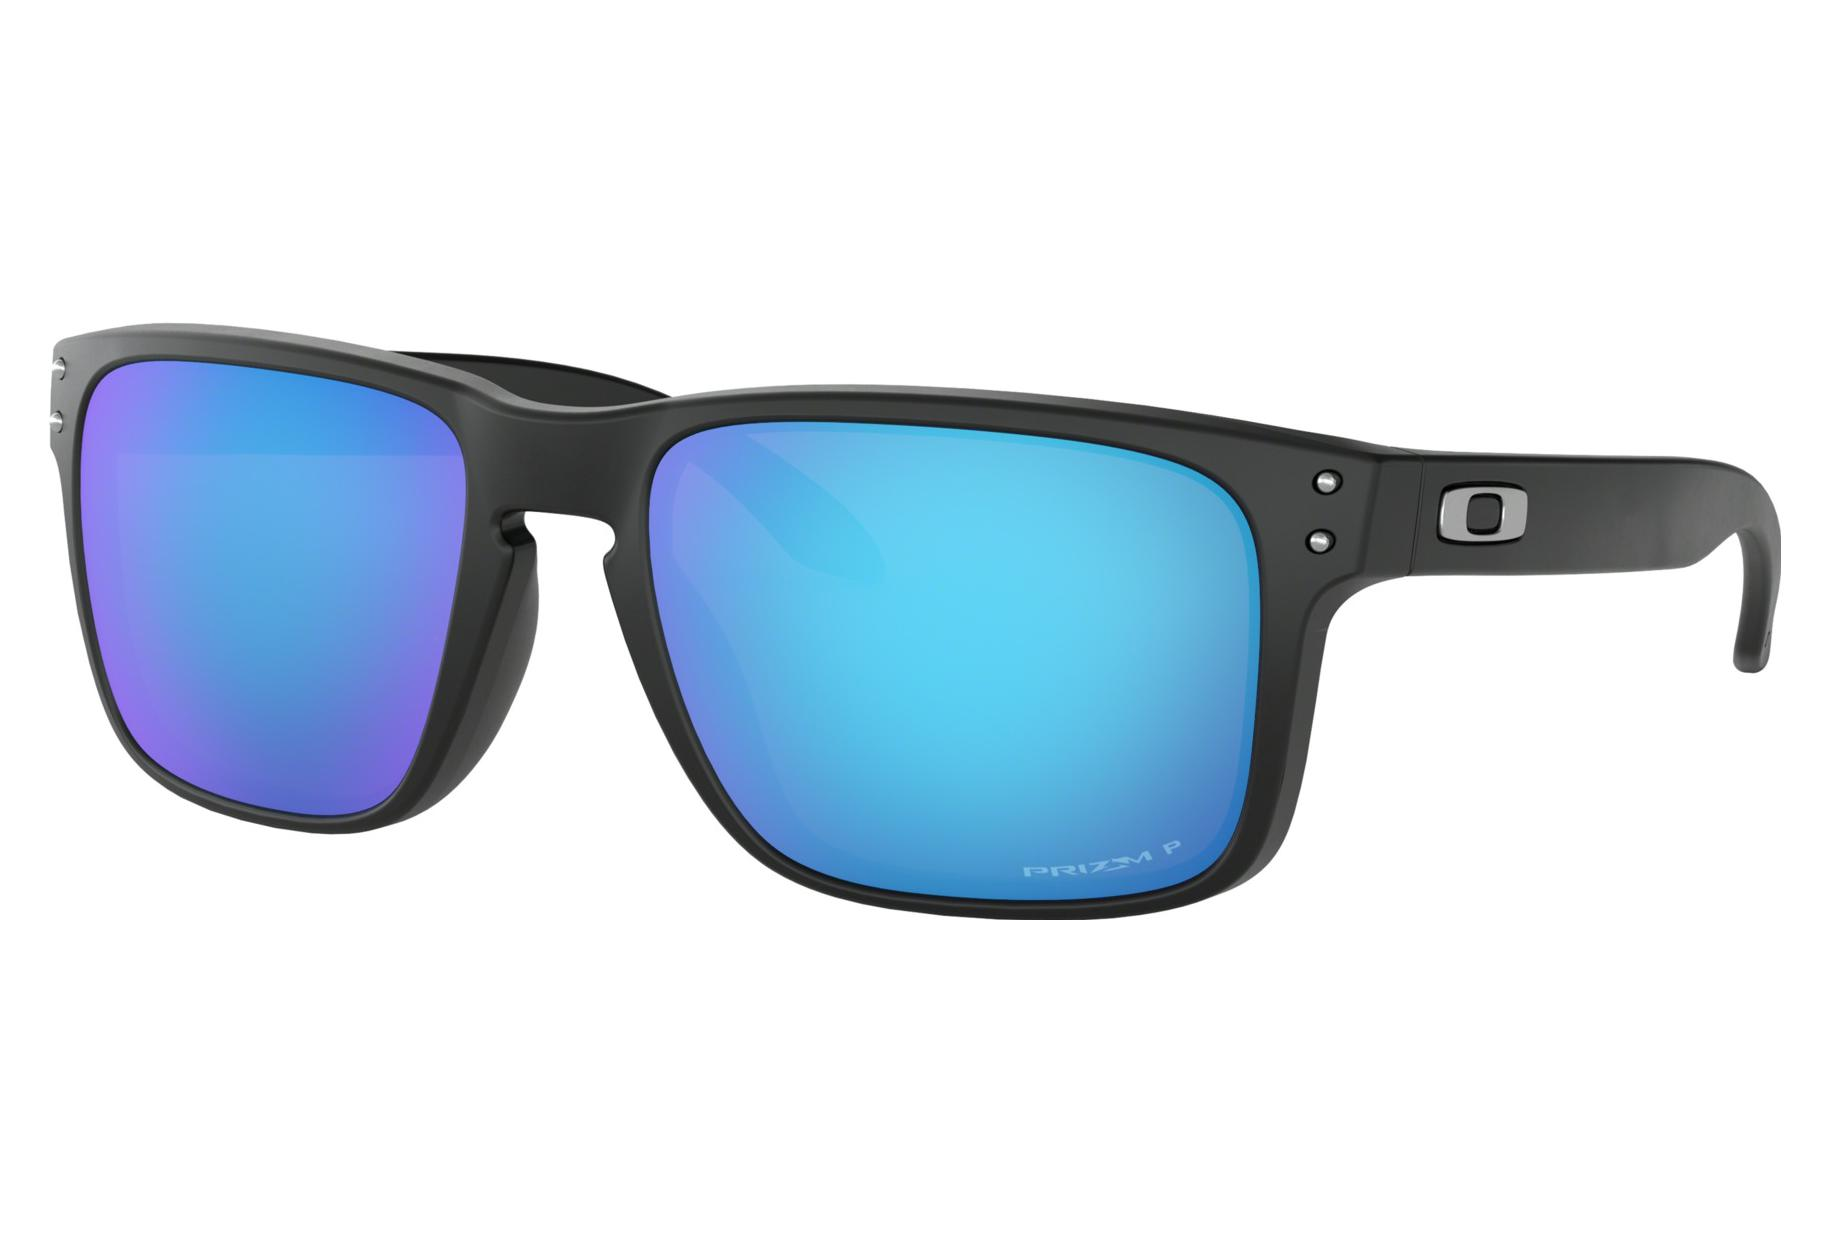 7a71f0f11d Oakley Sunglasses Holbrook Matte Black   Prizm Sapphire Polarized   Ref.  OO9102-F055